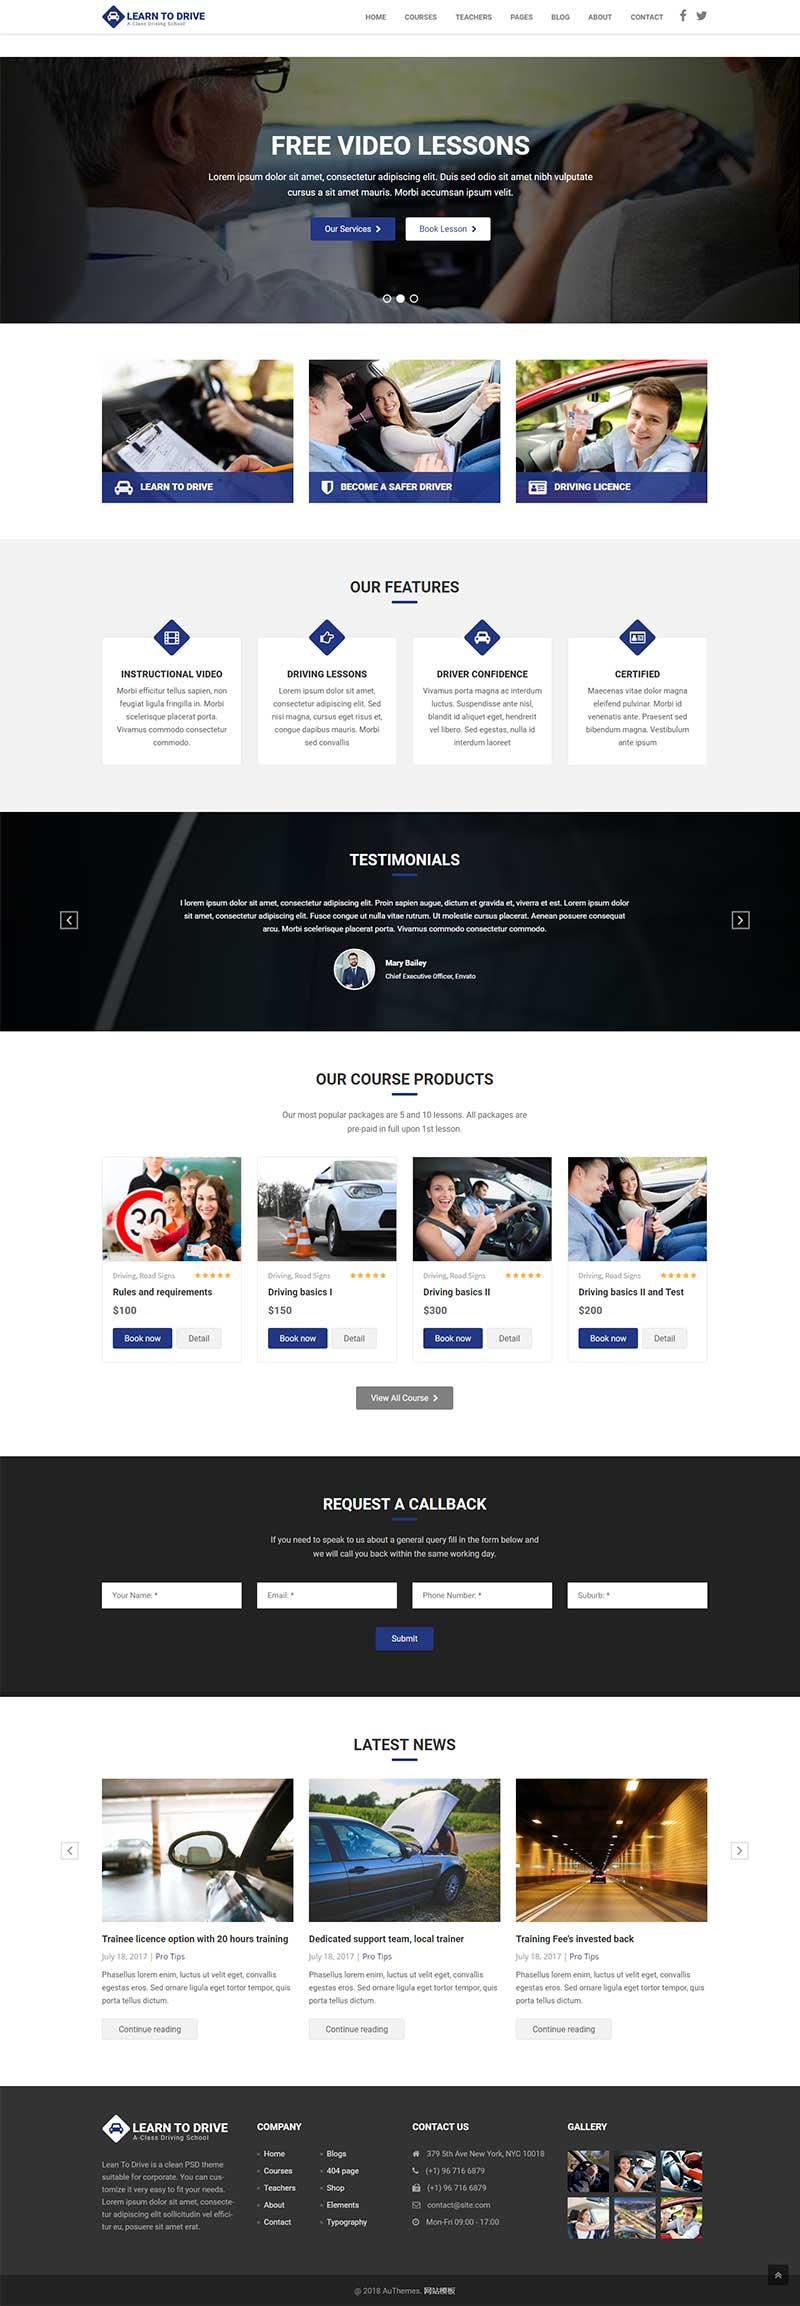 蓝色的Bootstrap学车驾校静态HTML网站模板